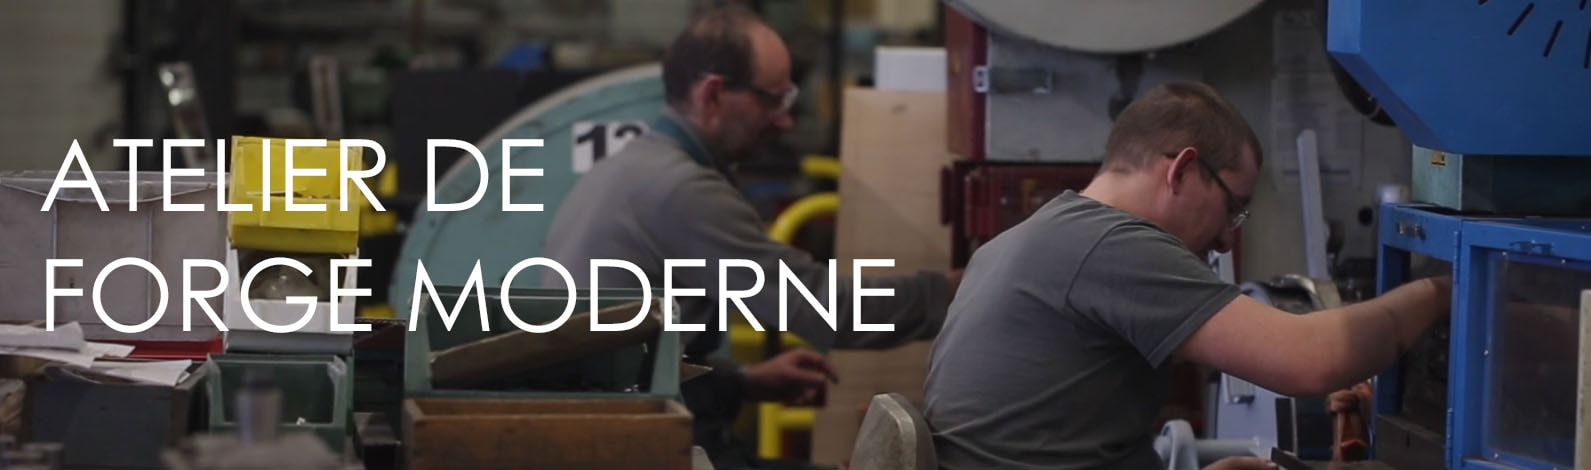 Atelier de forge moderne